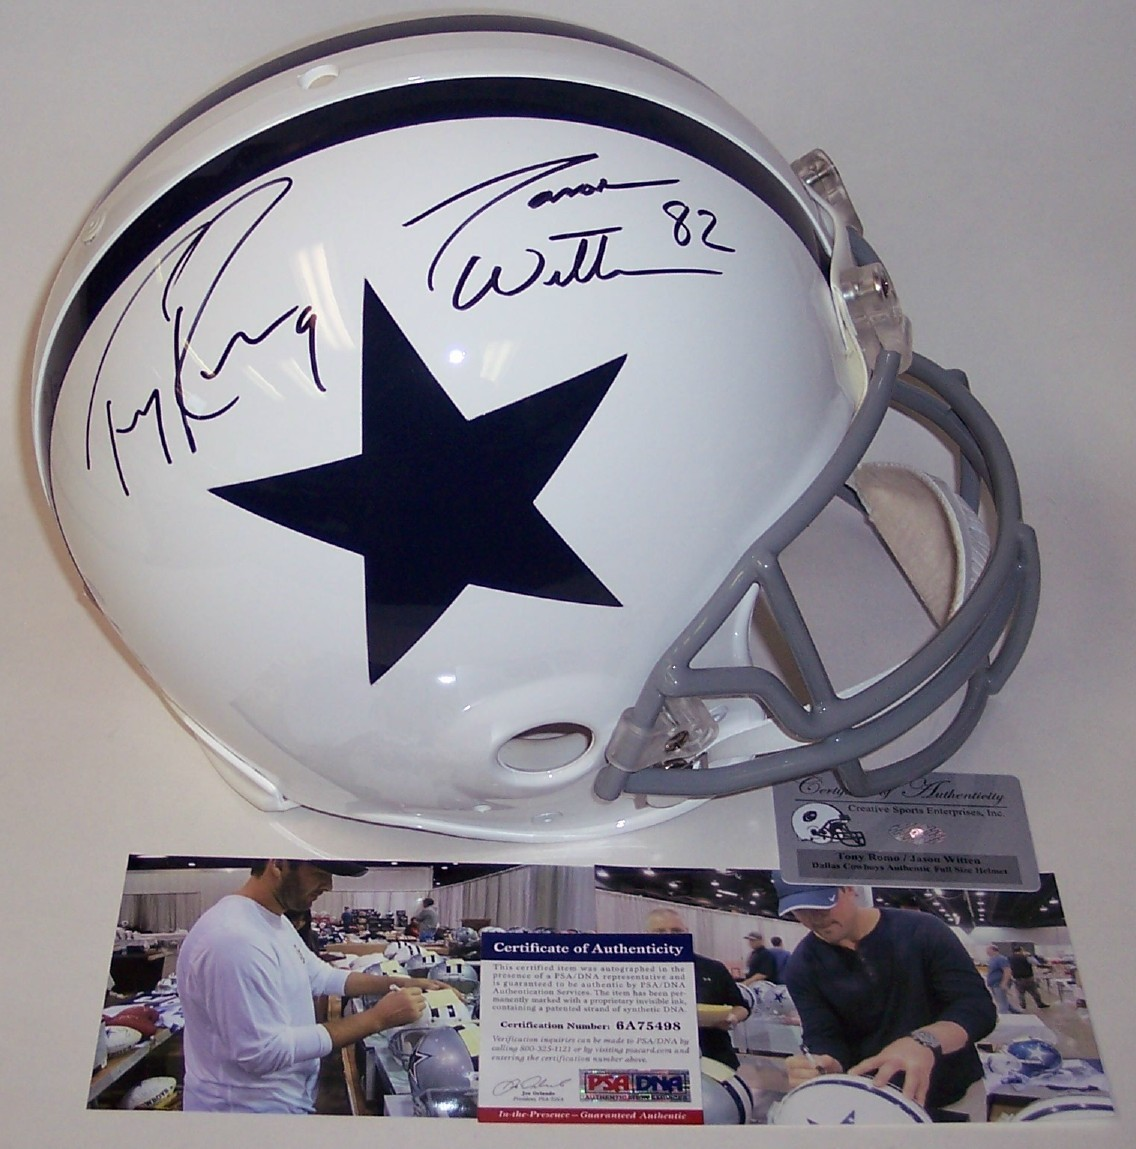 jason-witten-autographed-official-full-size-riddell-authentic-proline-football-helmet-dallas-cowboys-28-04054.1463020372.1280.1280.jpg